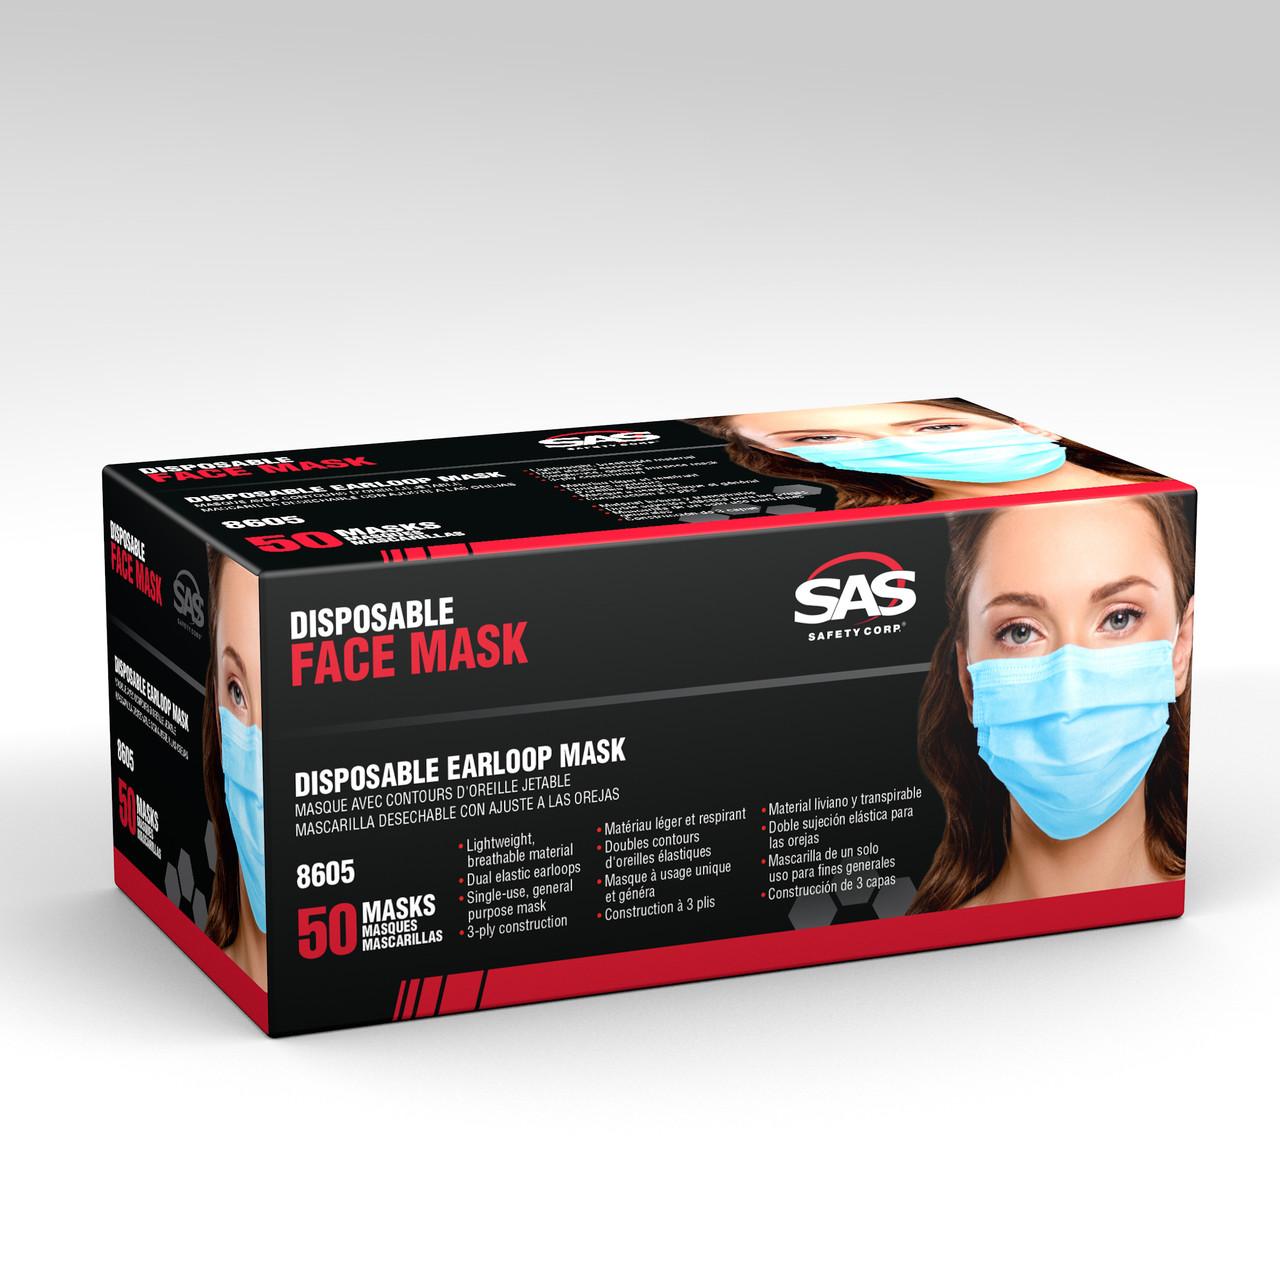 Blue Disposable Earloop Mask